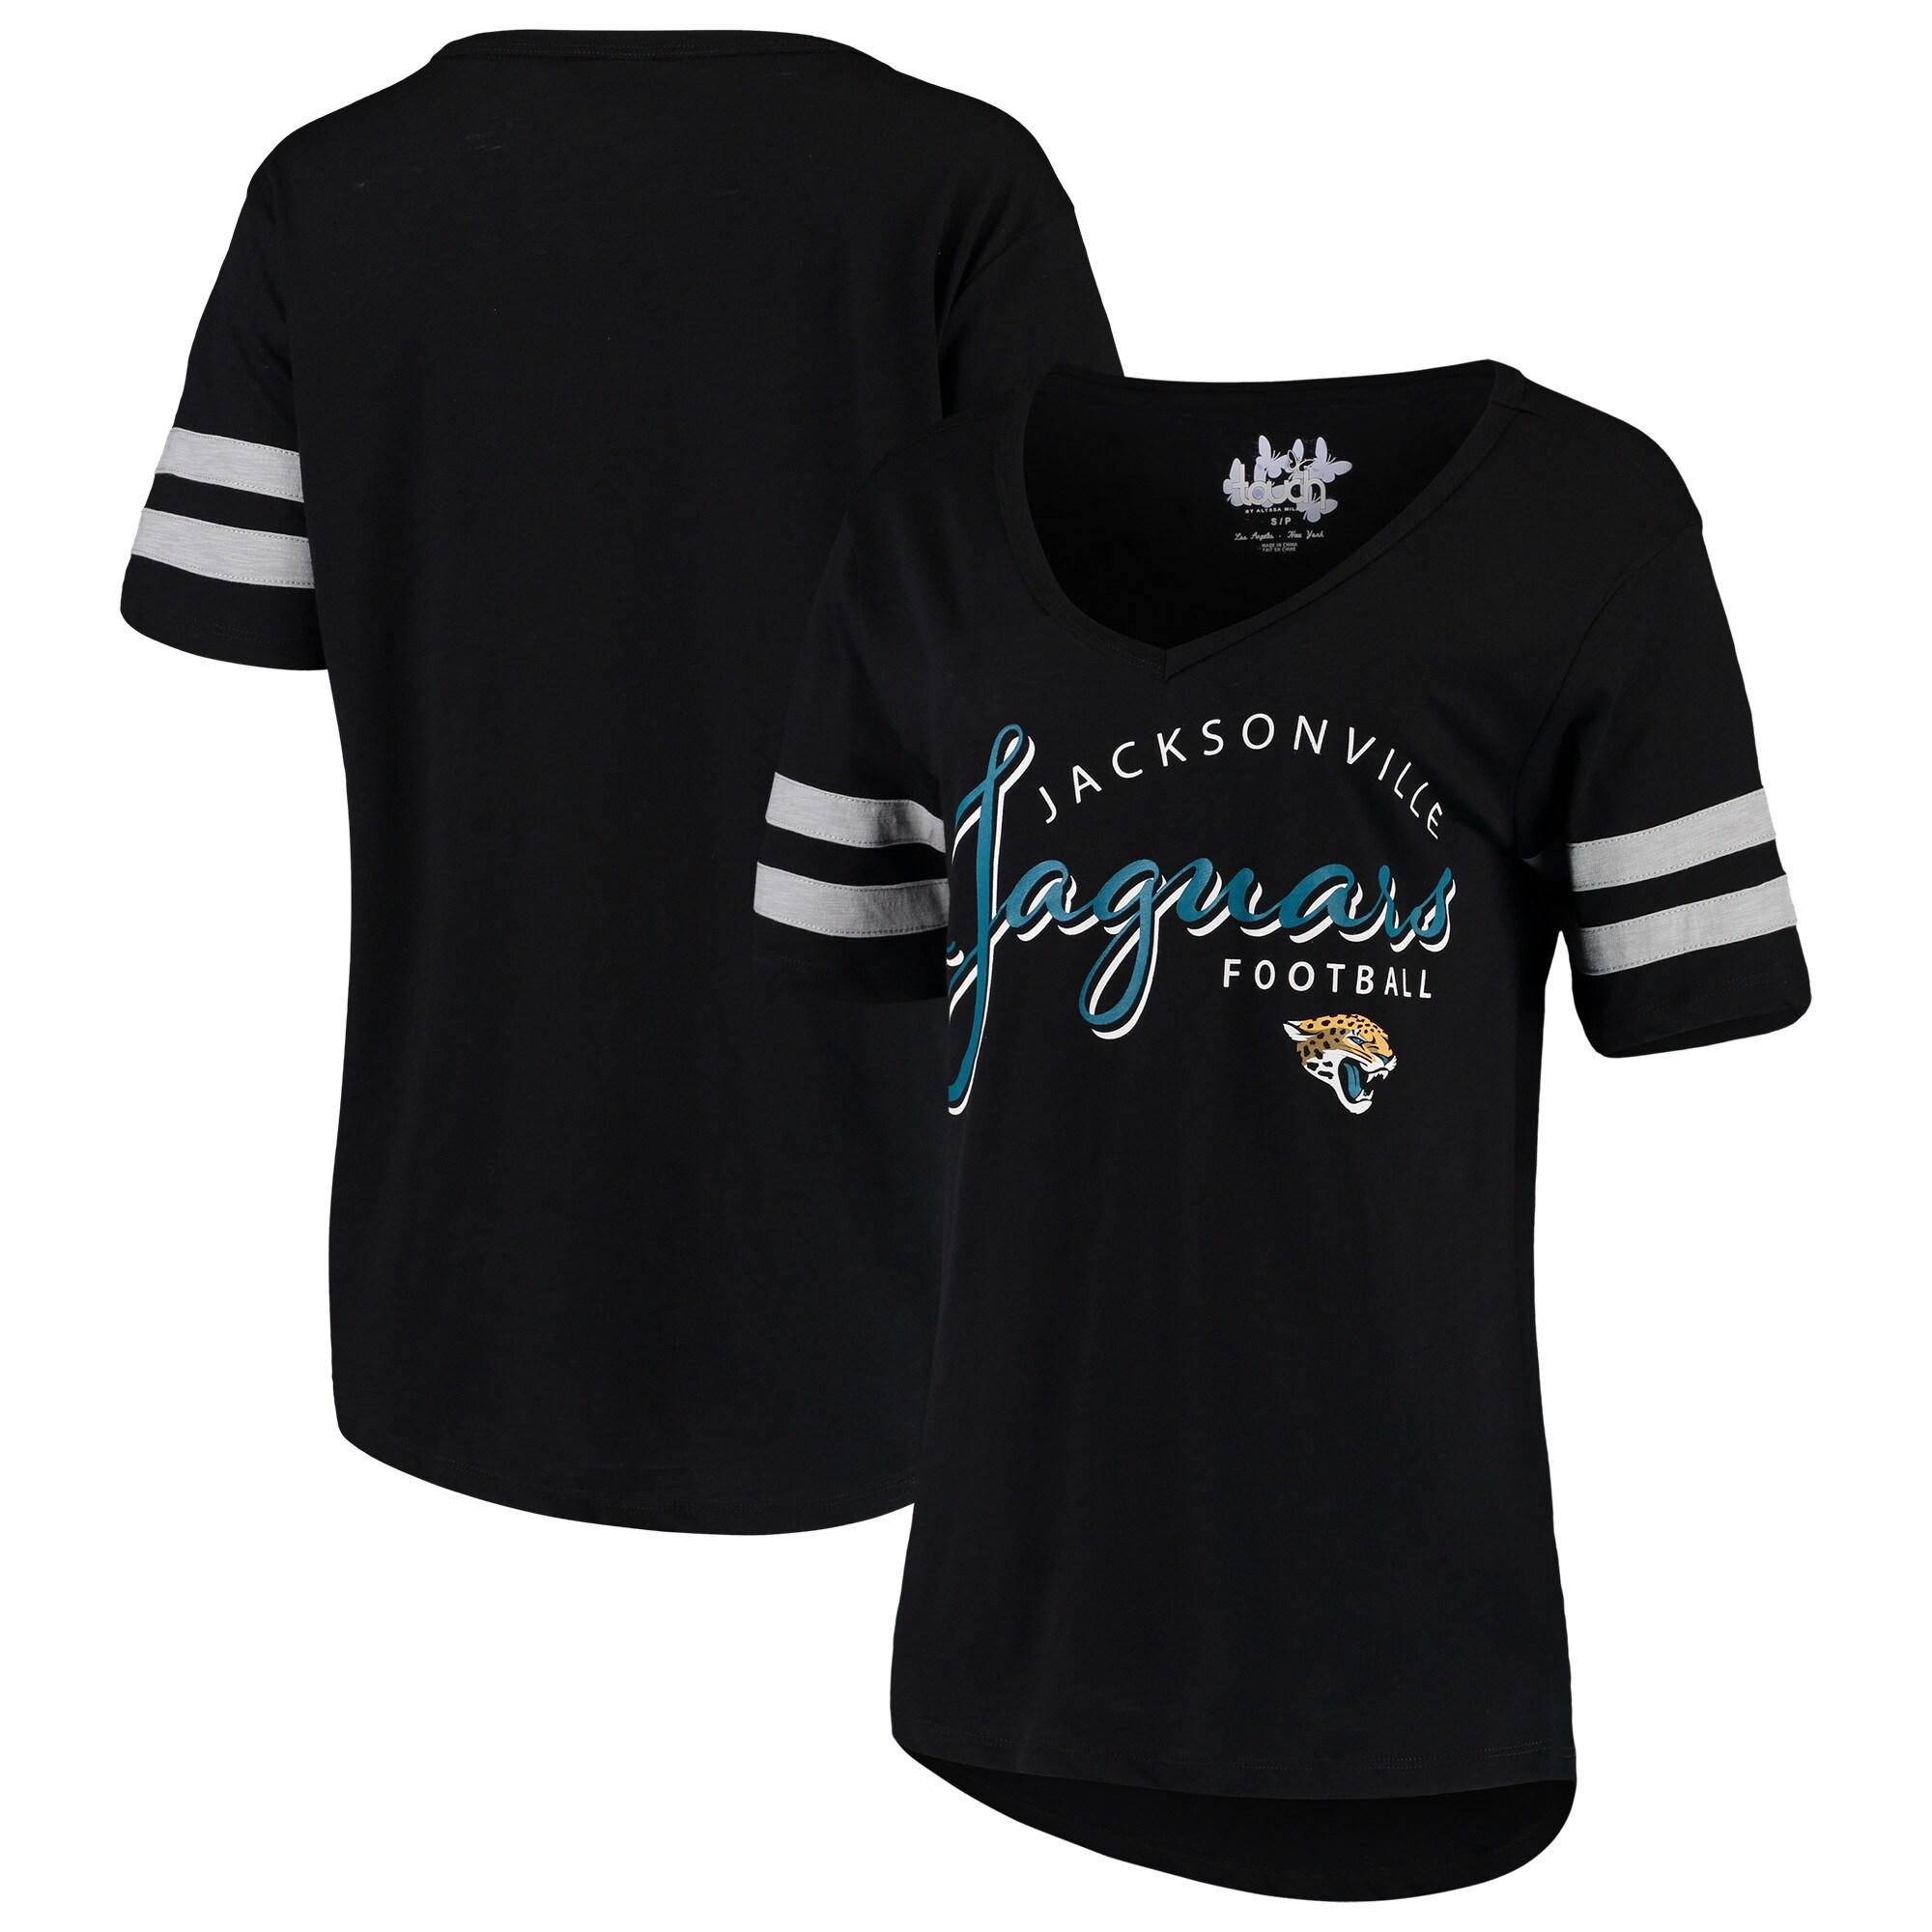 Jacksonville Jaguars Touch by Alyssa Milano Women's Triple Play V-Neck T-Shirt - Black